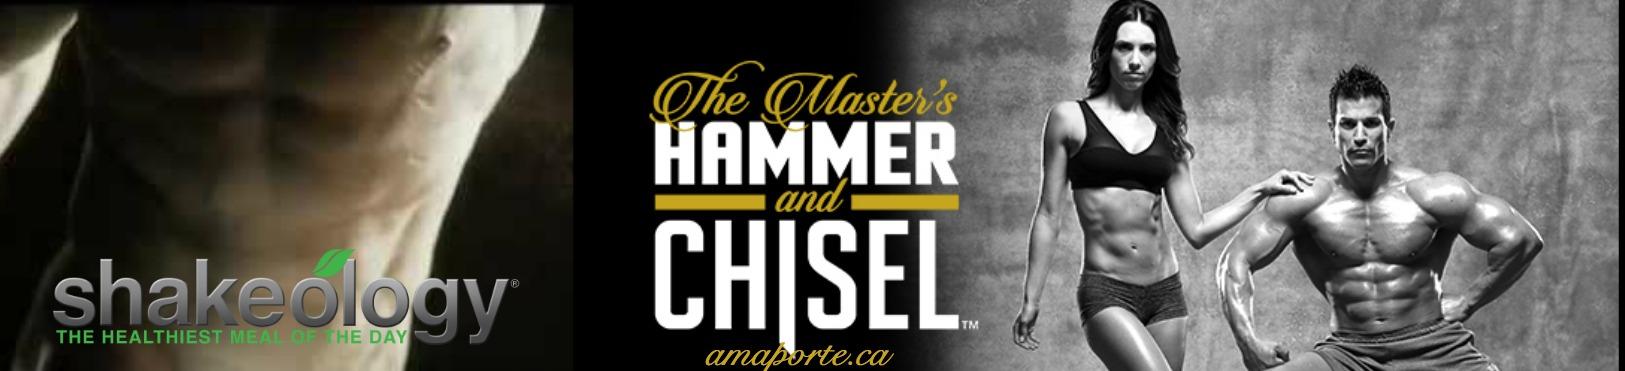 Hammer & chisel Slider amaporte